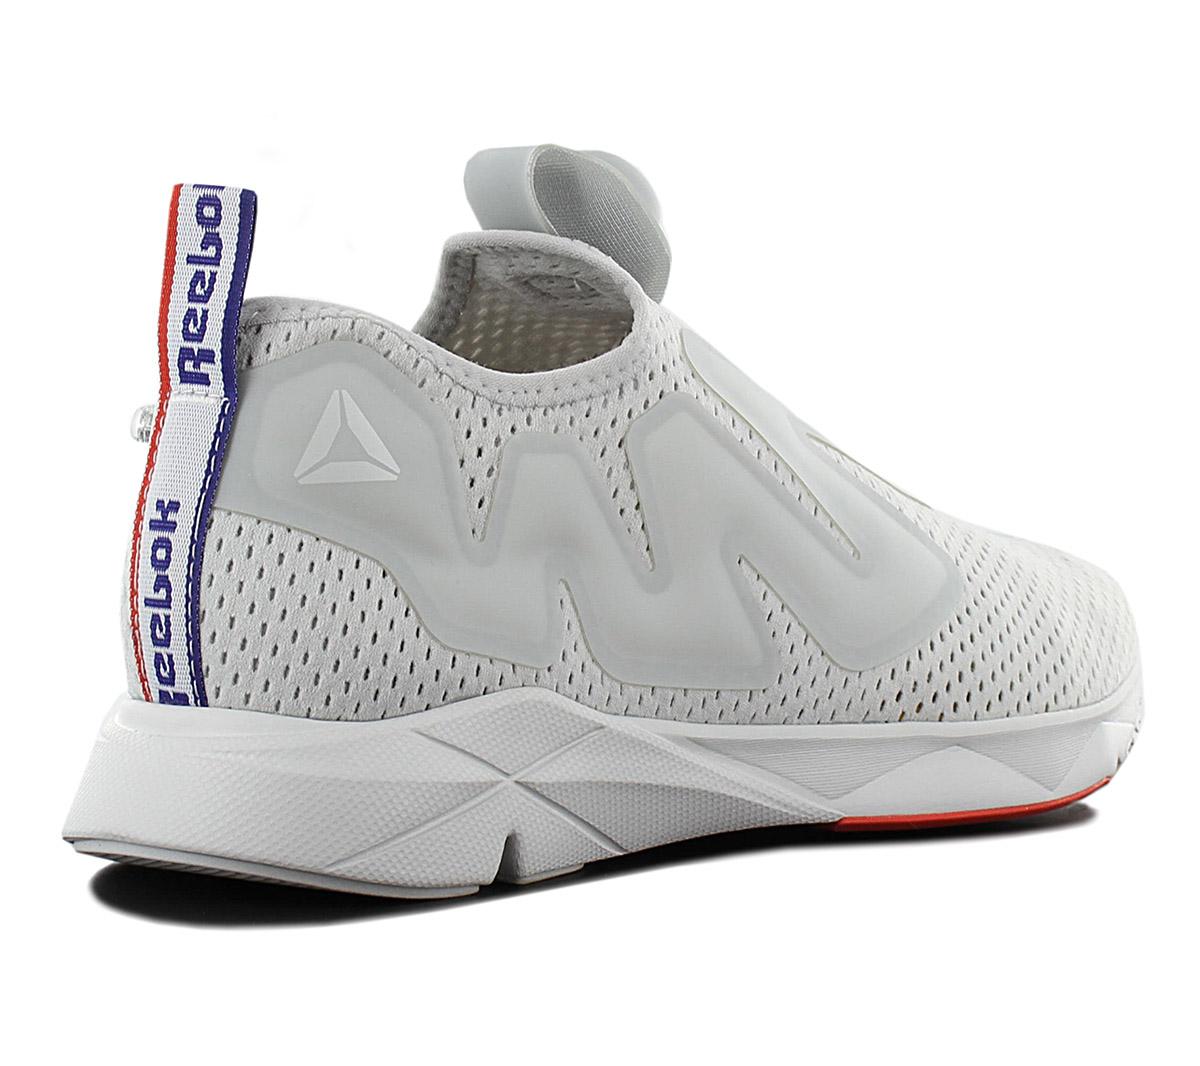 New Savings on Reebok Pump Supreme Tape sneakers White